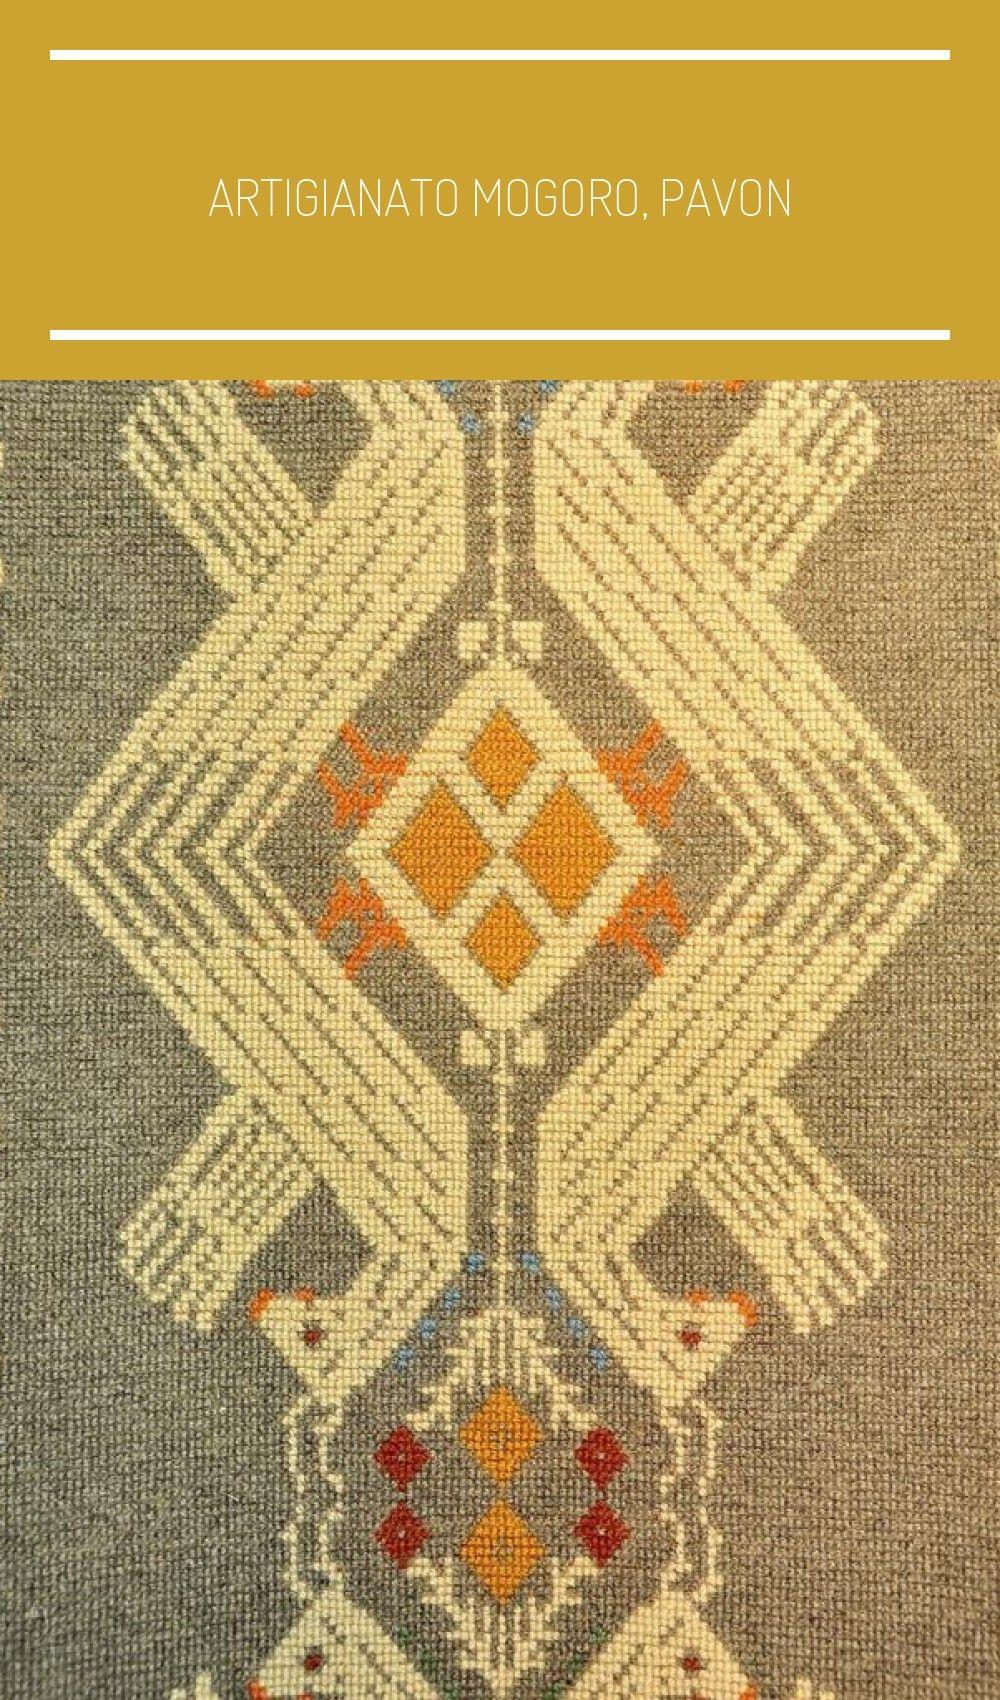 Artigianato Mogoro, pavoni. #arte tessile sarda